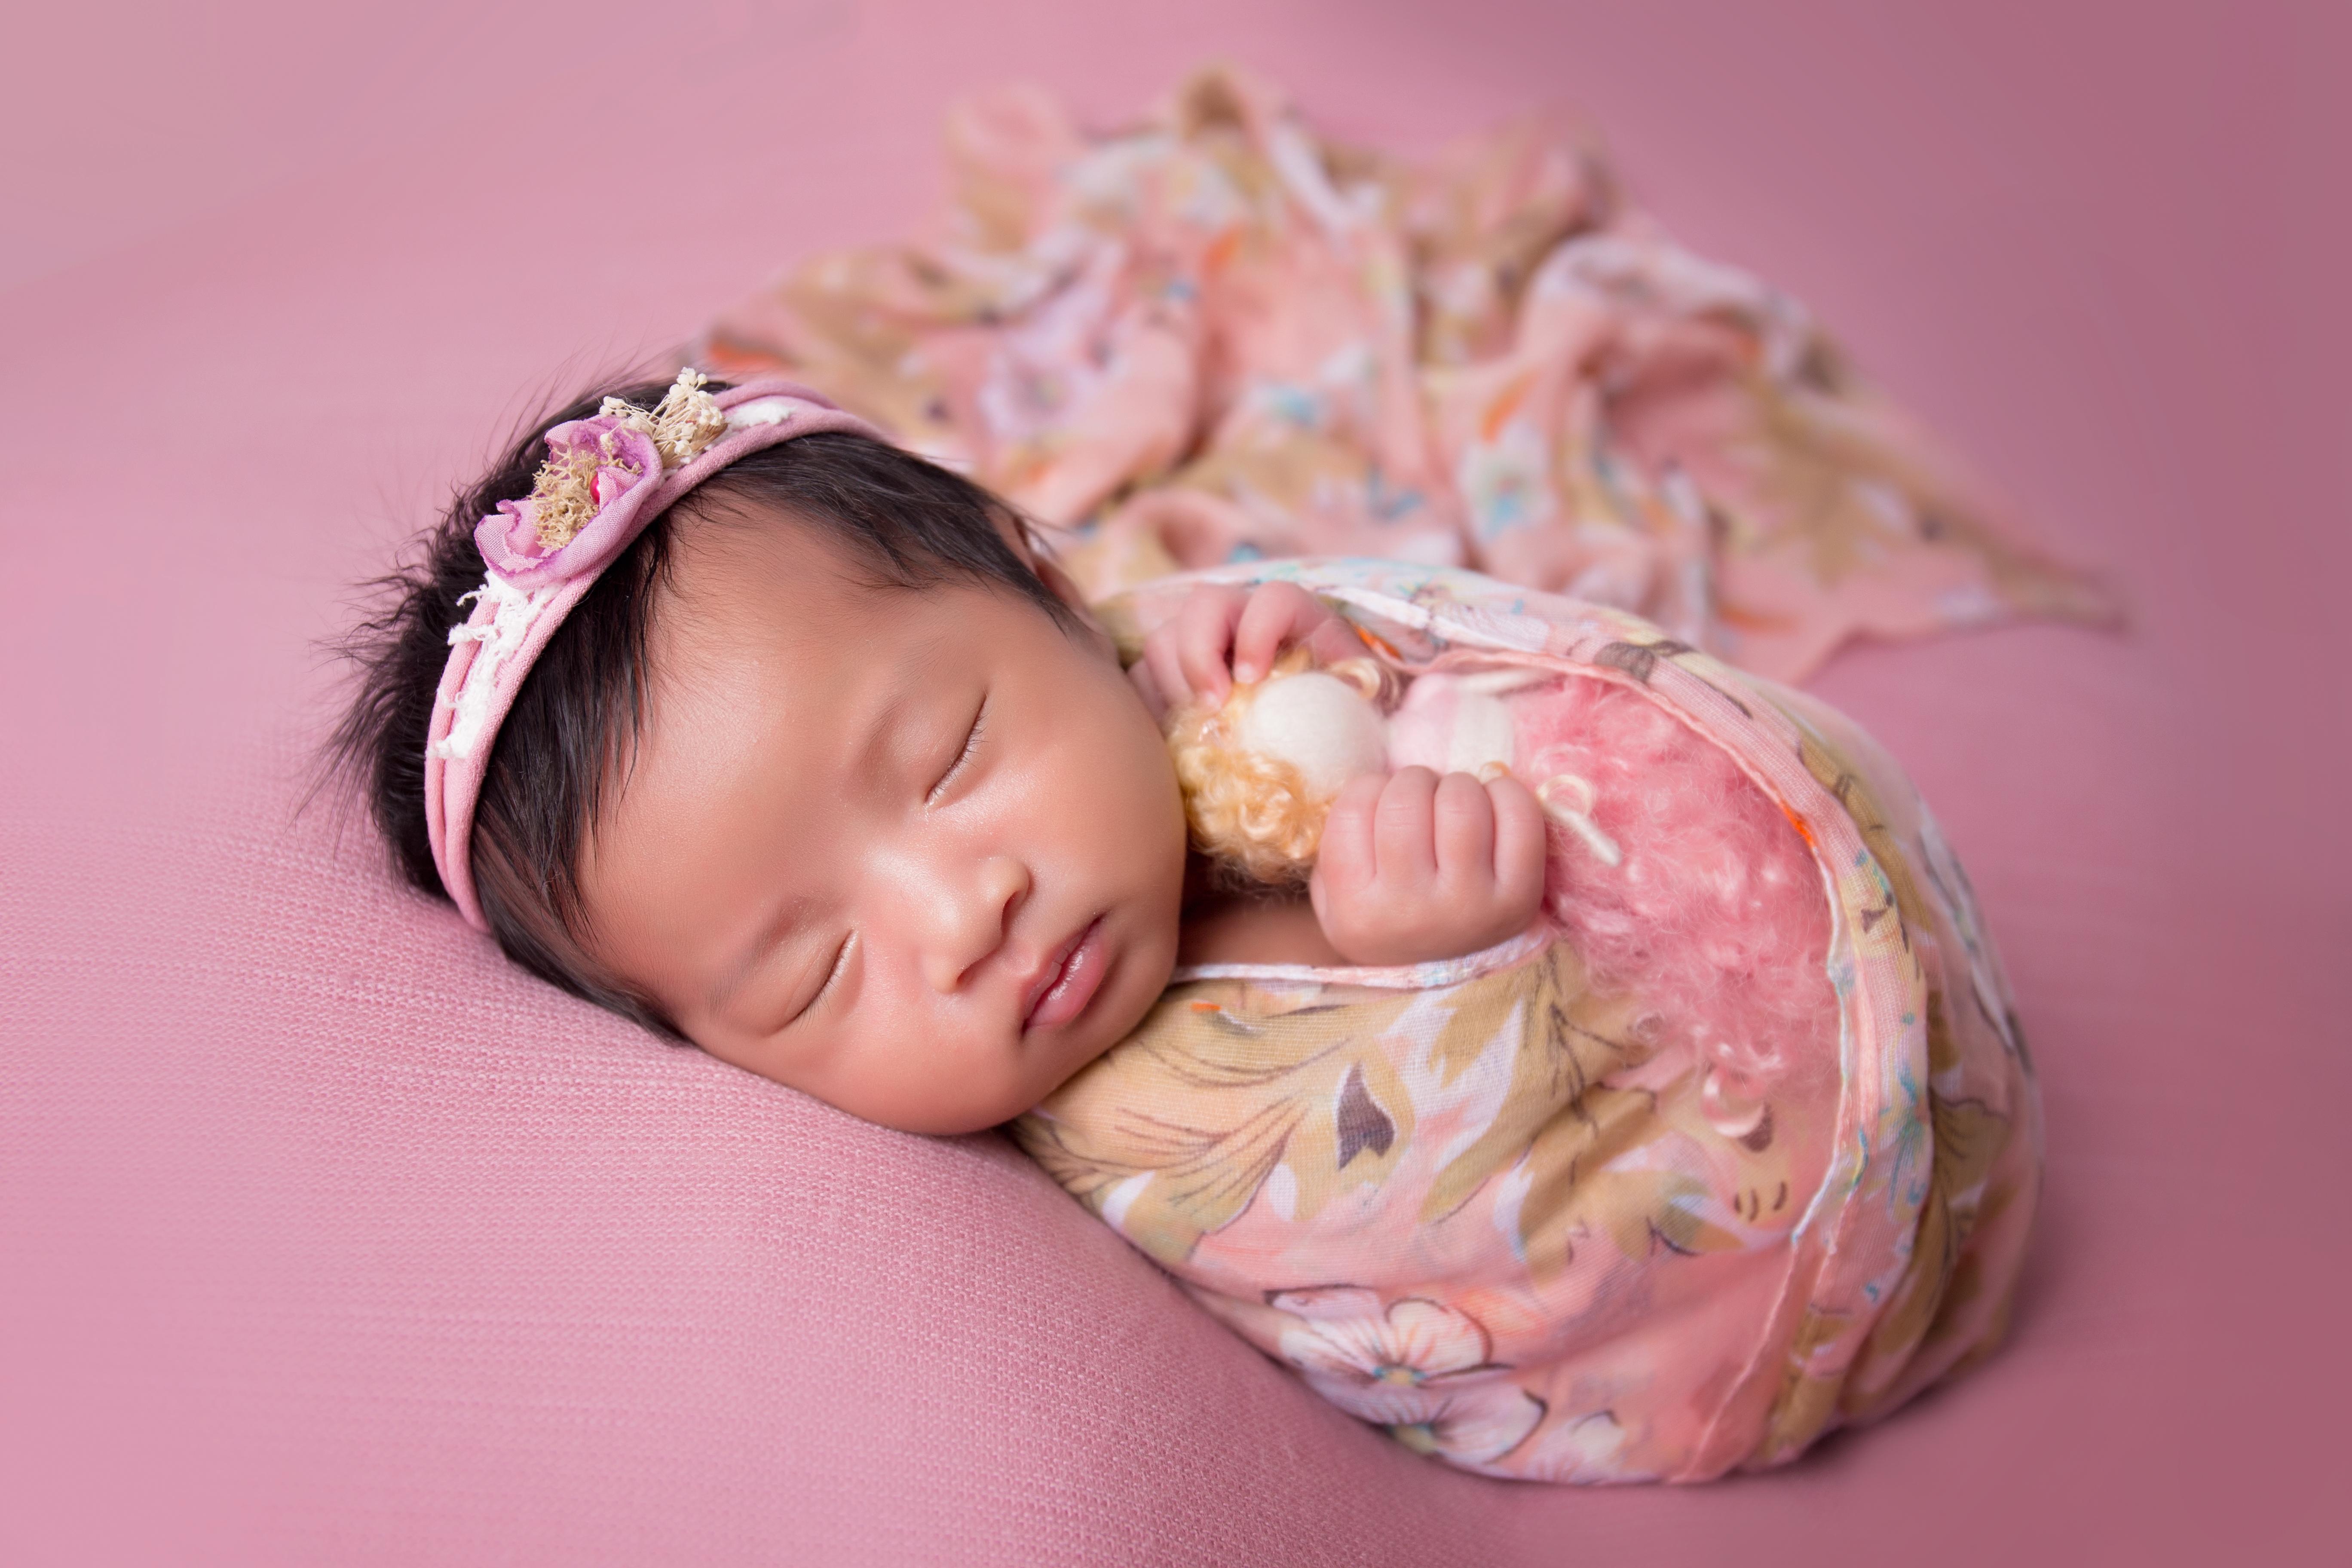 Baby Nurkeisya Airysta ~ 17days old